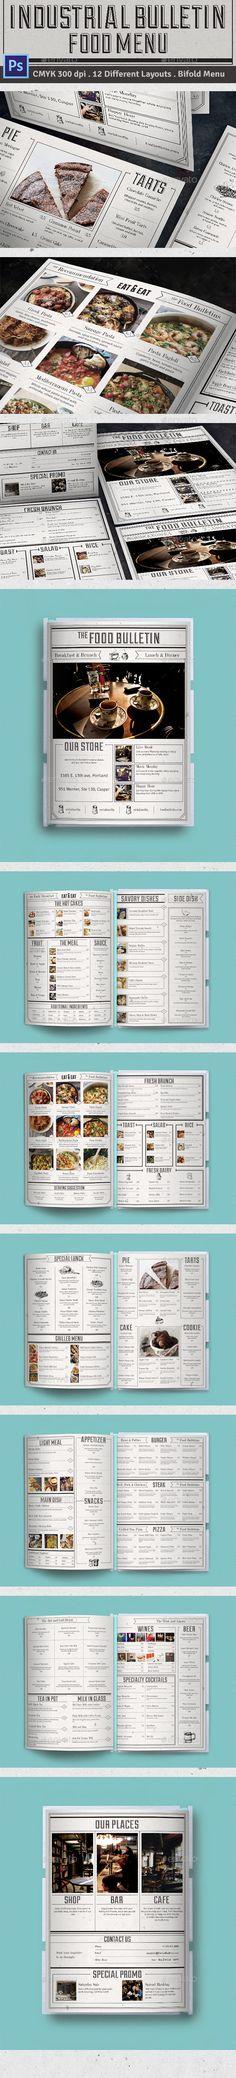 Bulletin Food Menu Template PSD #design Download: http://graphicriver.net/item/bulletin-food-menu/14330331?ref=ksioks